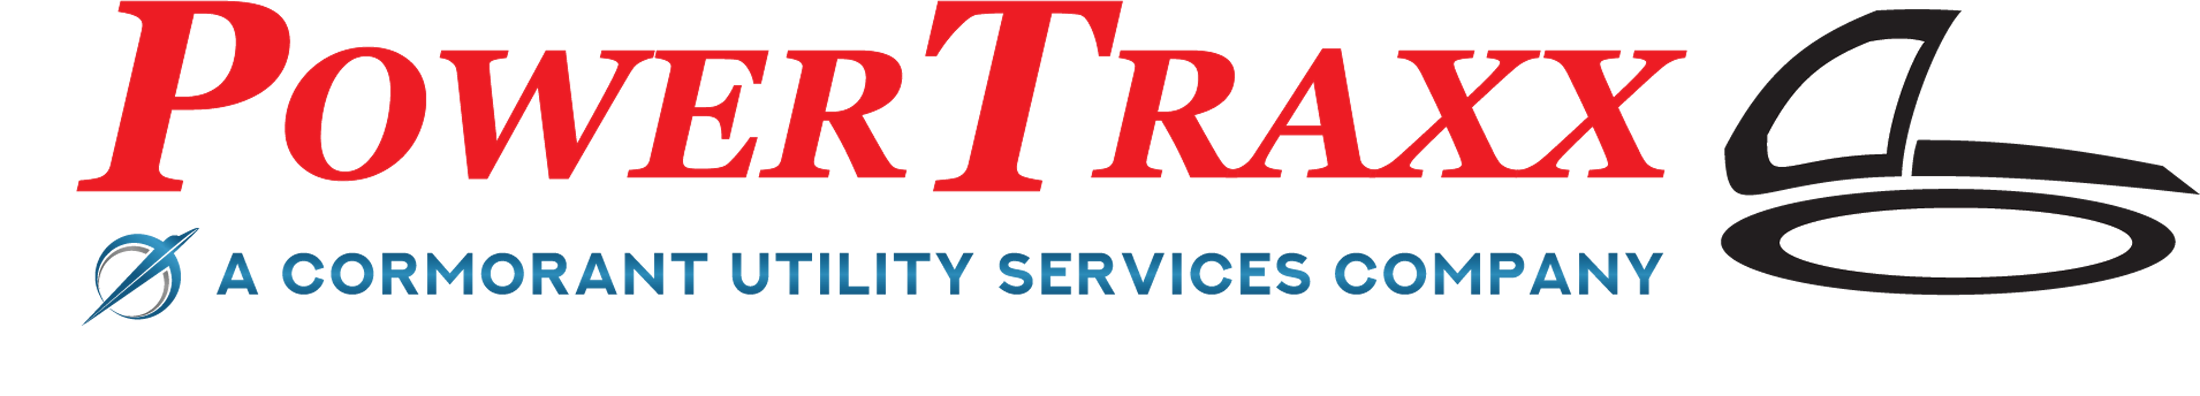 Spare Parts | PowerTraxx Vehicles Inc